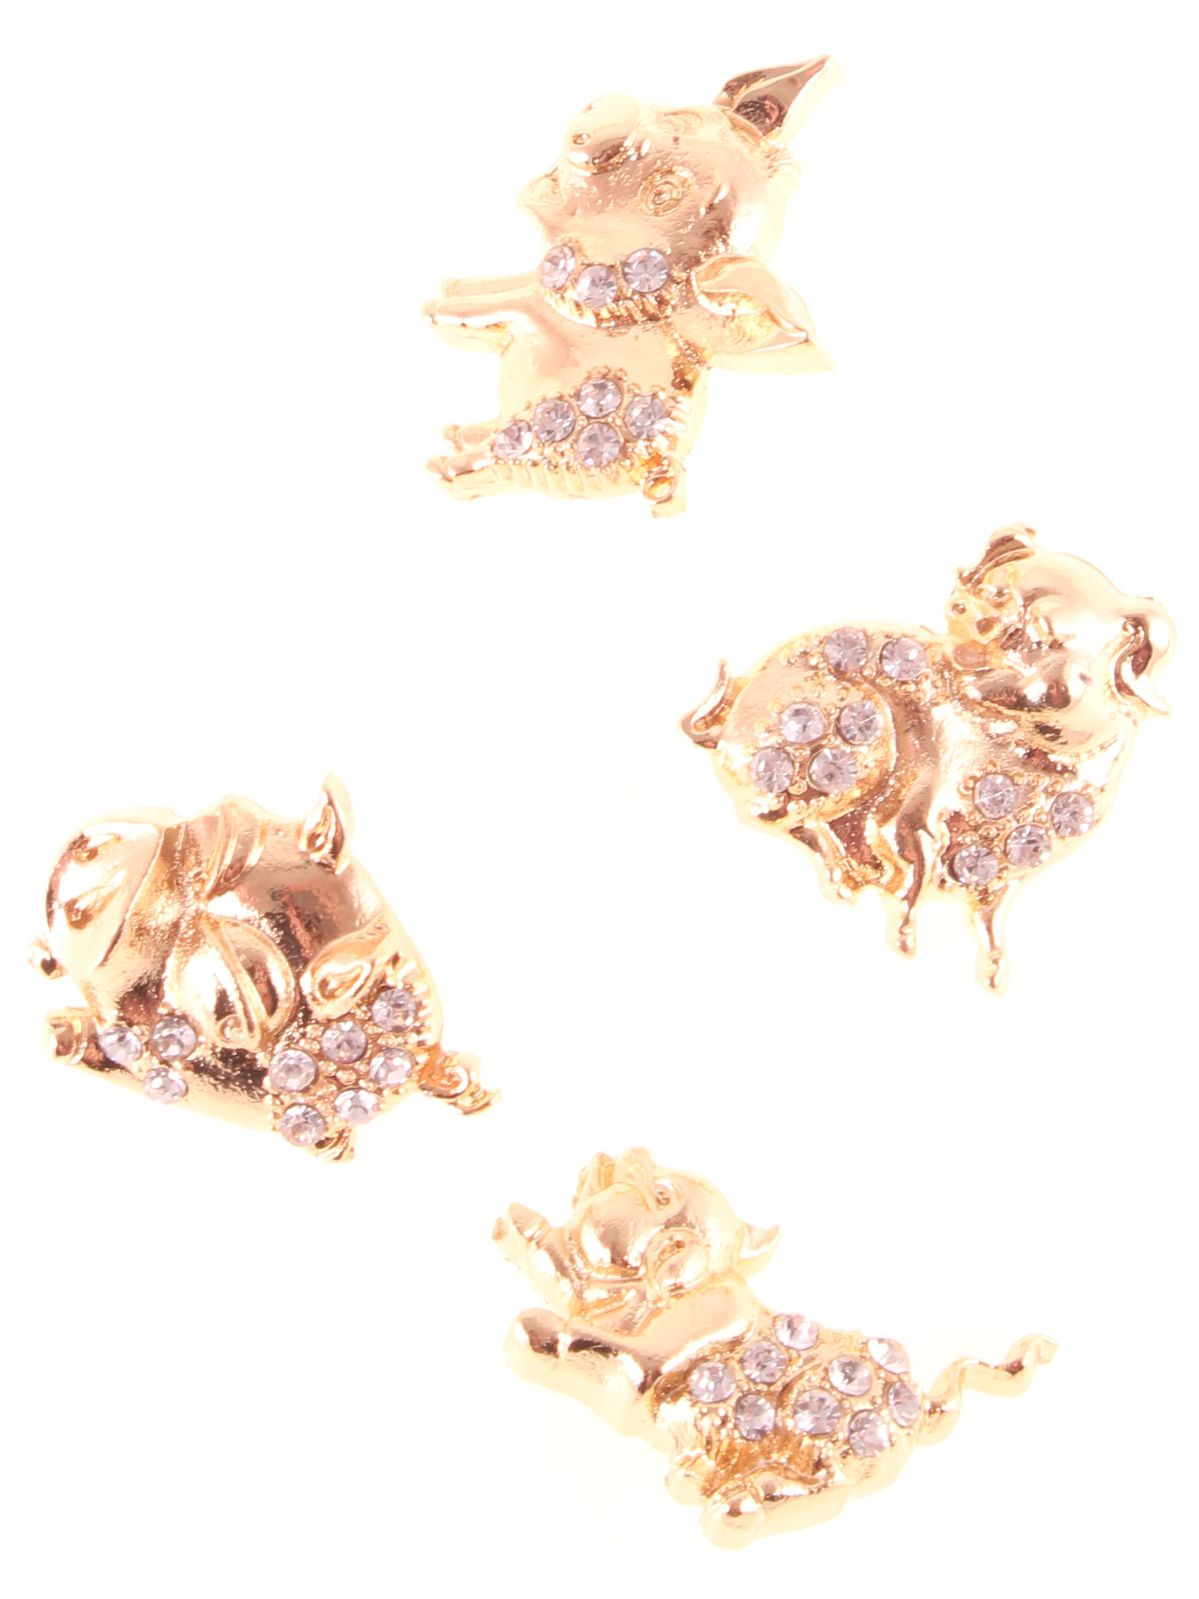 Брошь Hello Trendy, 7426936729144, золотой, 4 шт trendy round neck cut out 1 2 sleeve wrap romper for women